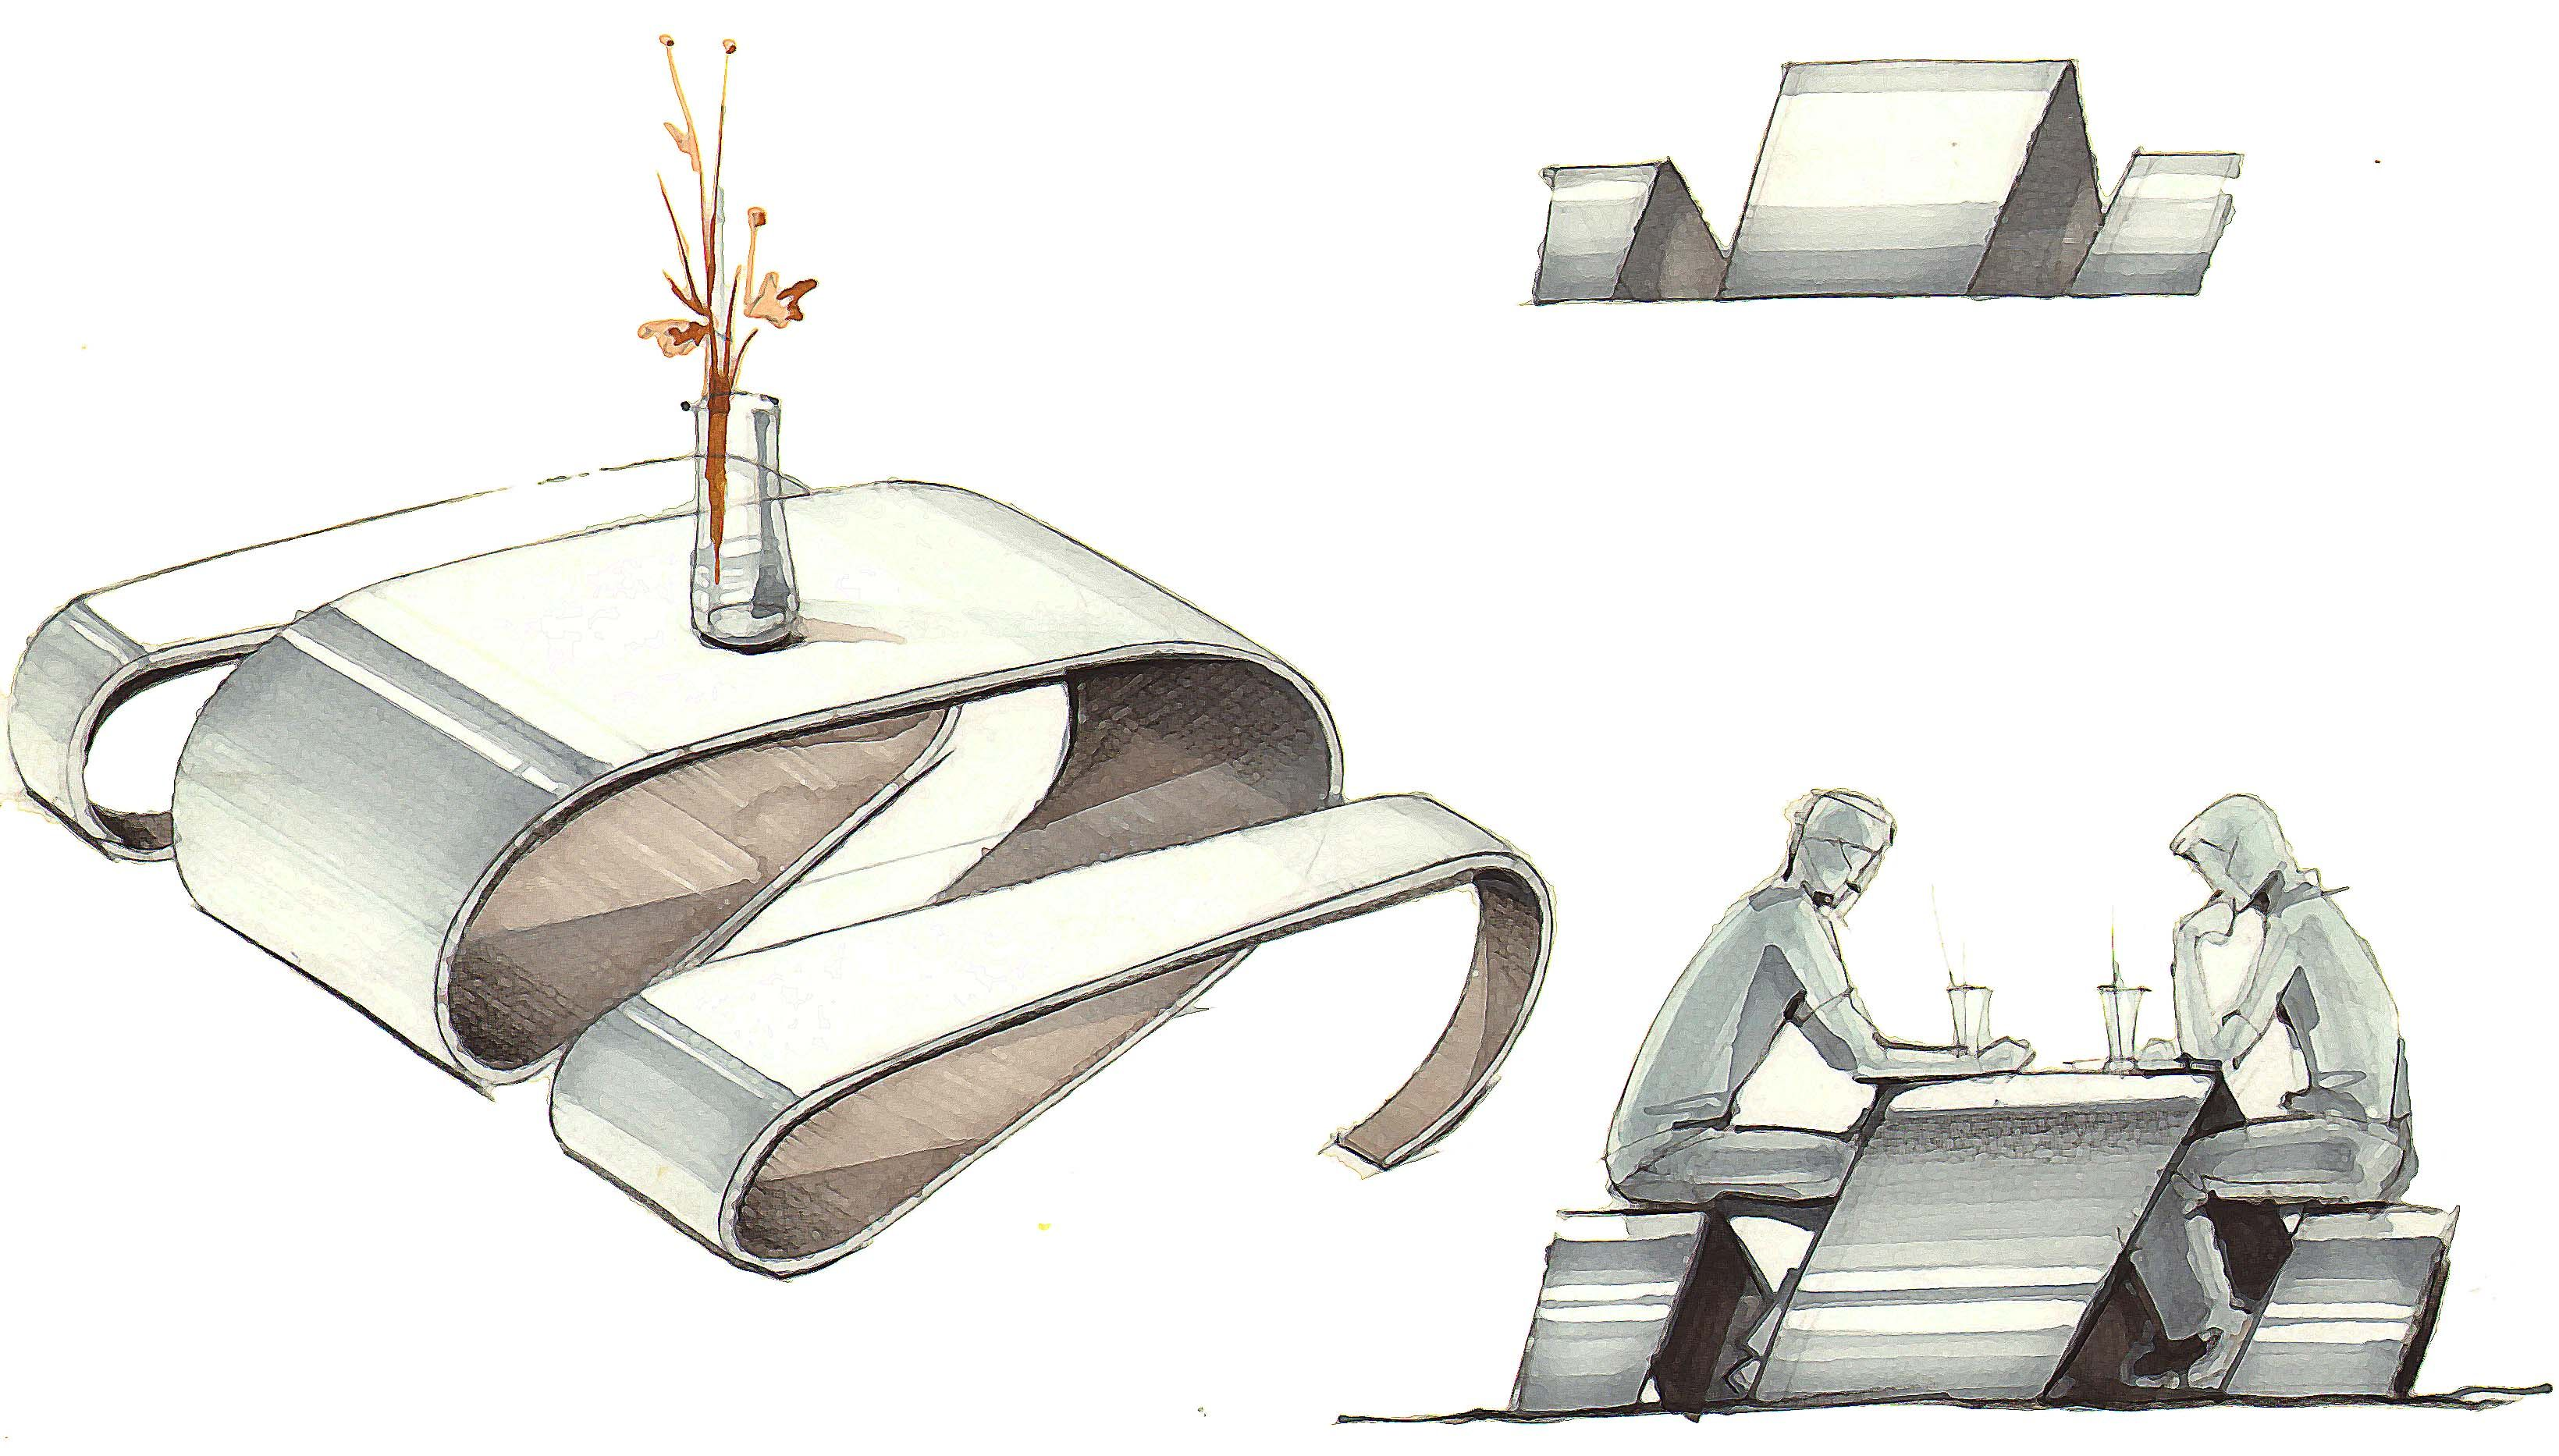 Amazing decor furniture design sketches with original for Stuhl design analyse